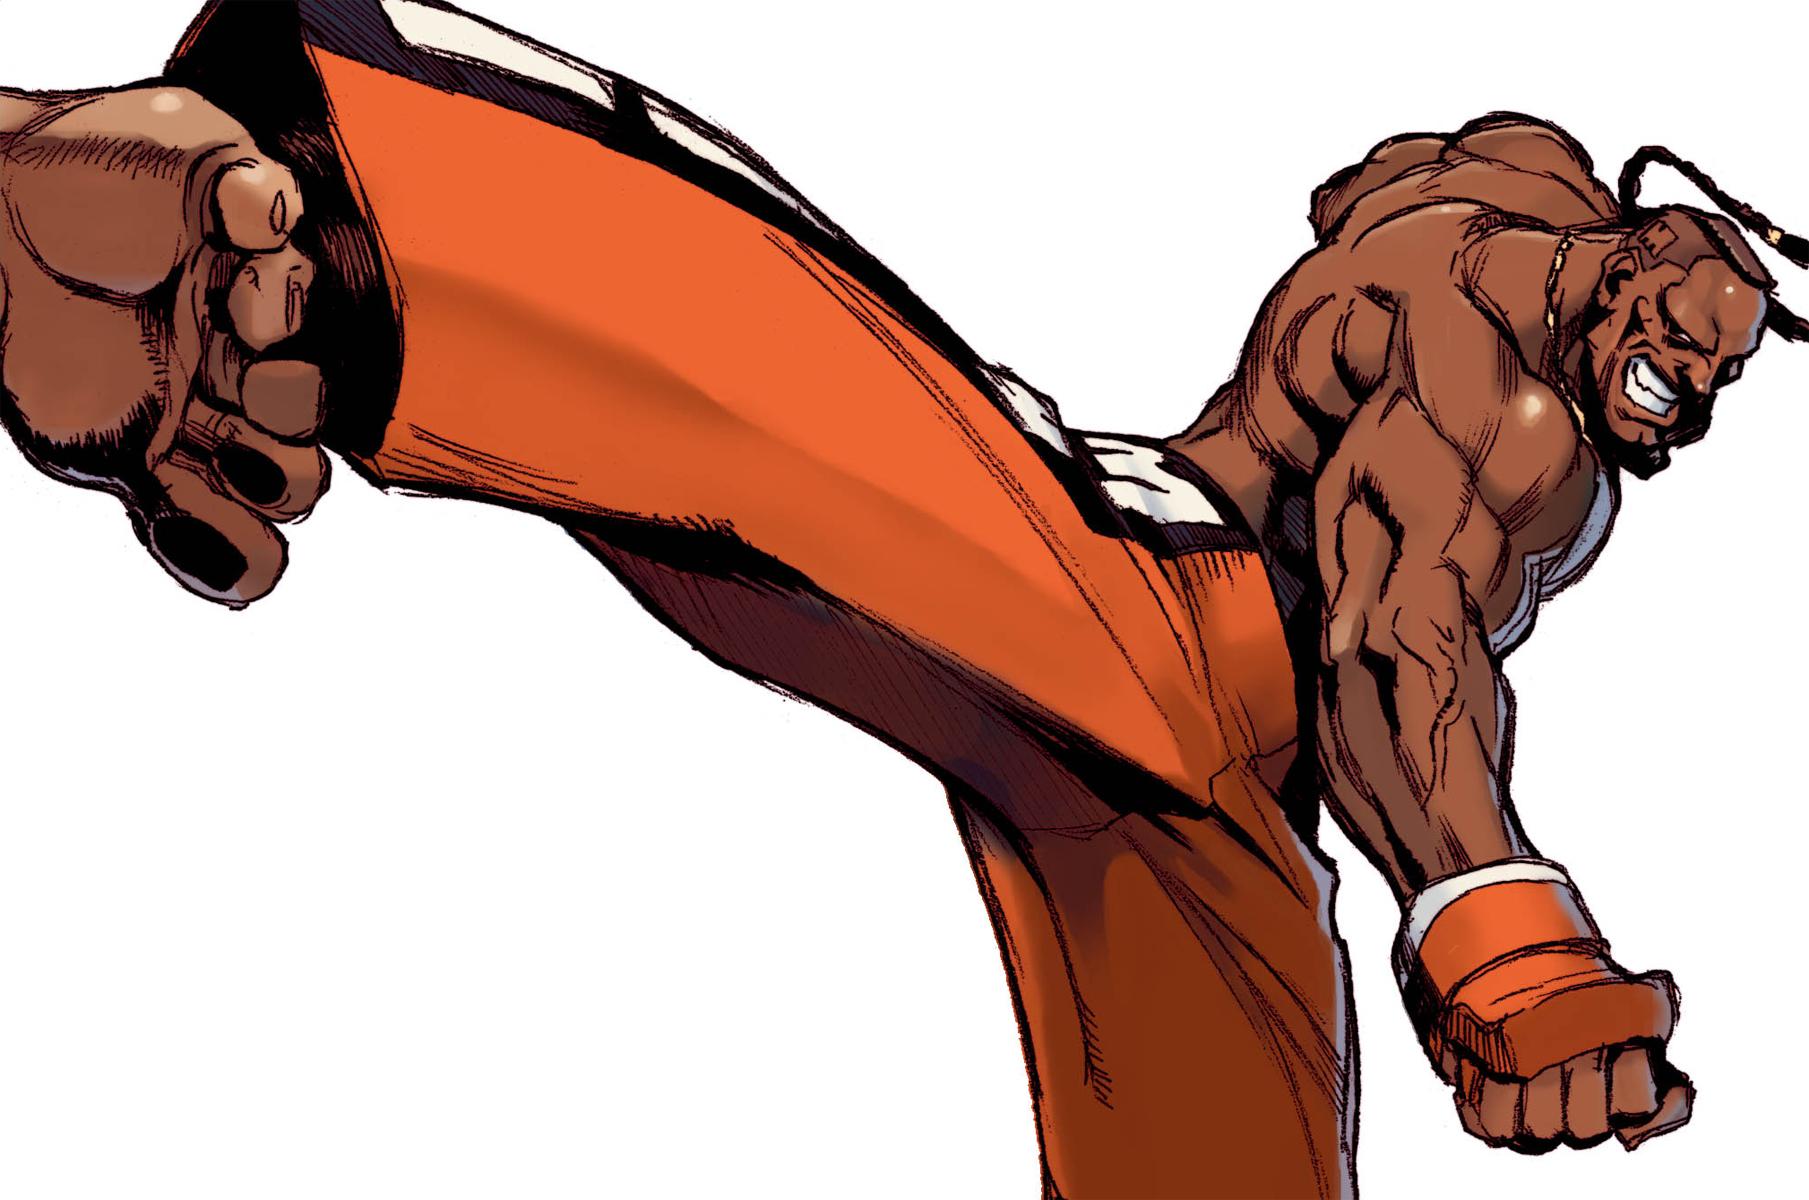 Super Street Fighter 2 Turbo Revival - C-Super Street Fighter 2 Turbo Revival - Character Artwork. u003e-12